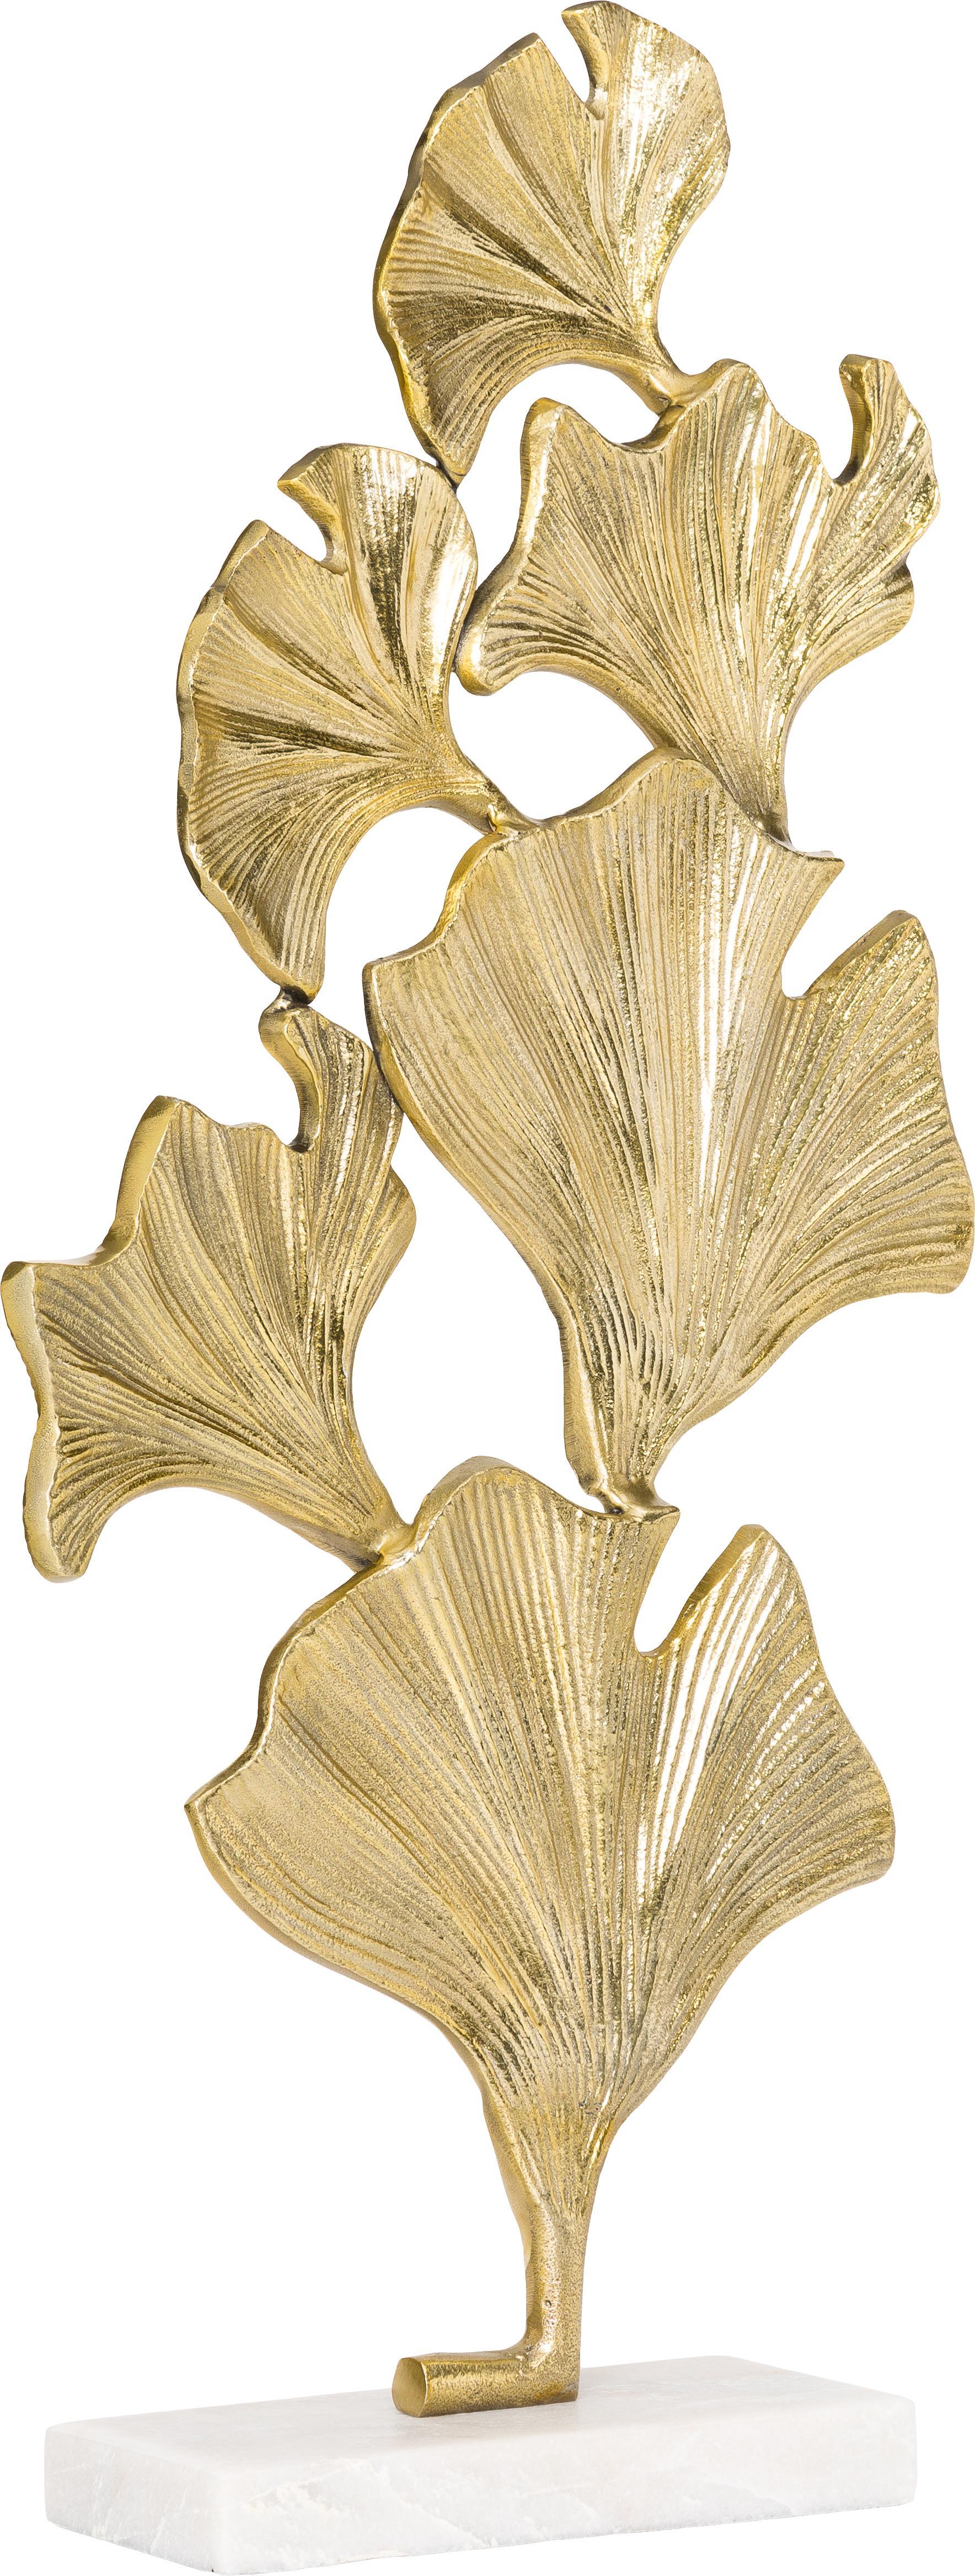 Deko-Objekt Duke, Sockel: Marmor, Goldfarben, 35 x 70 cm